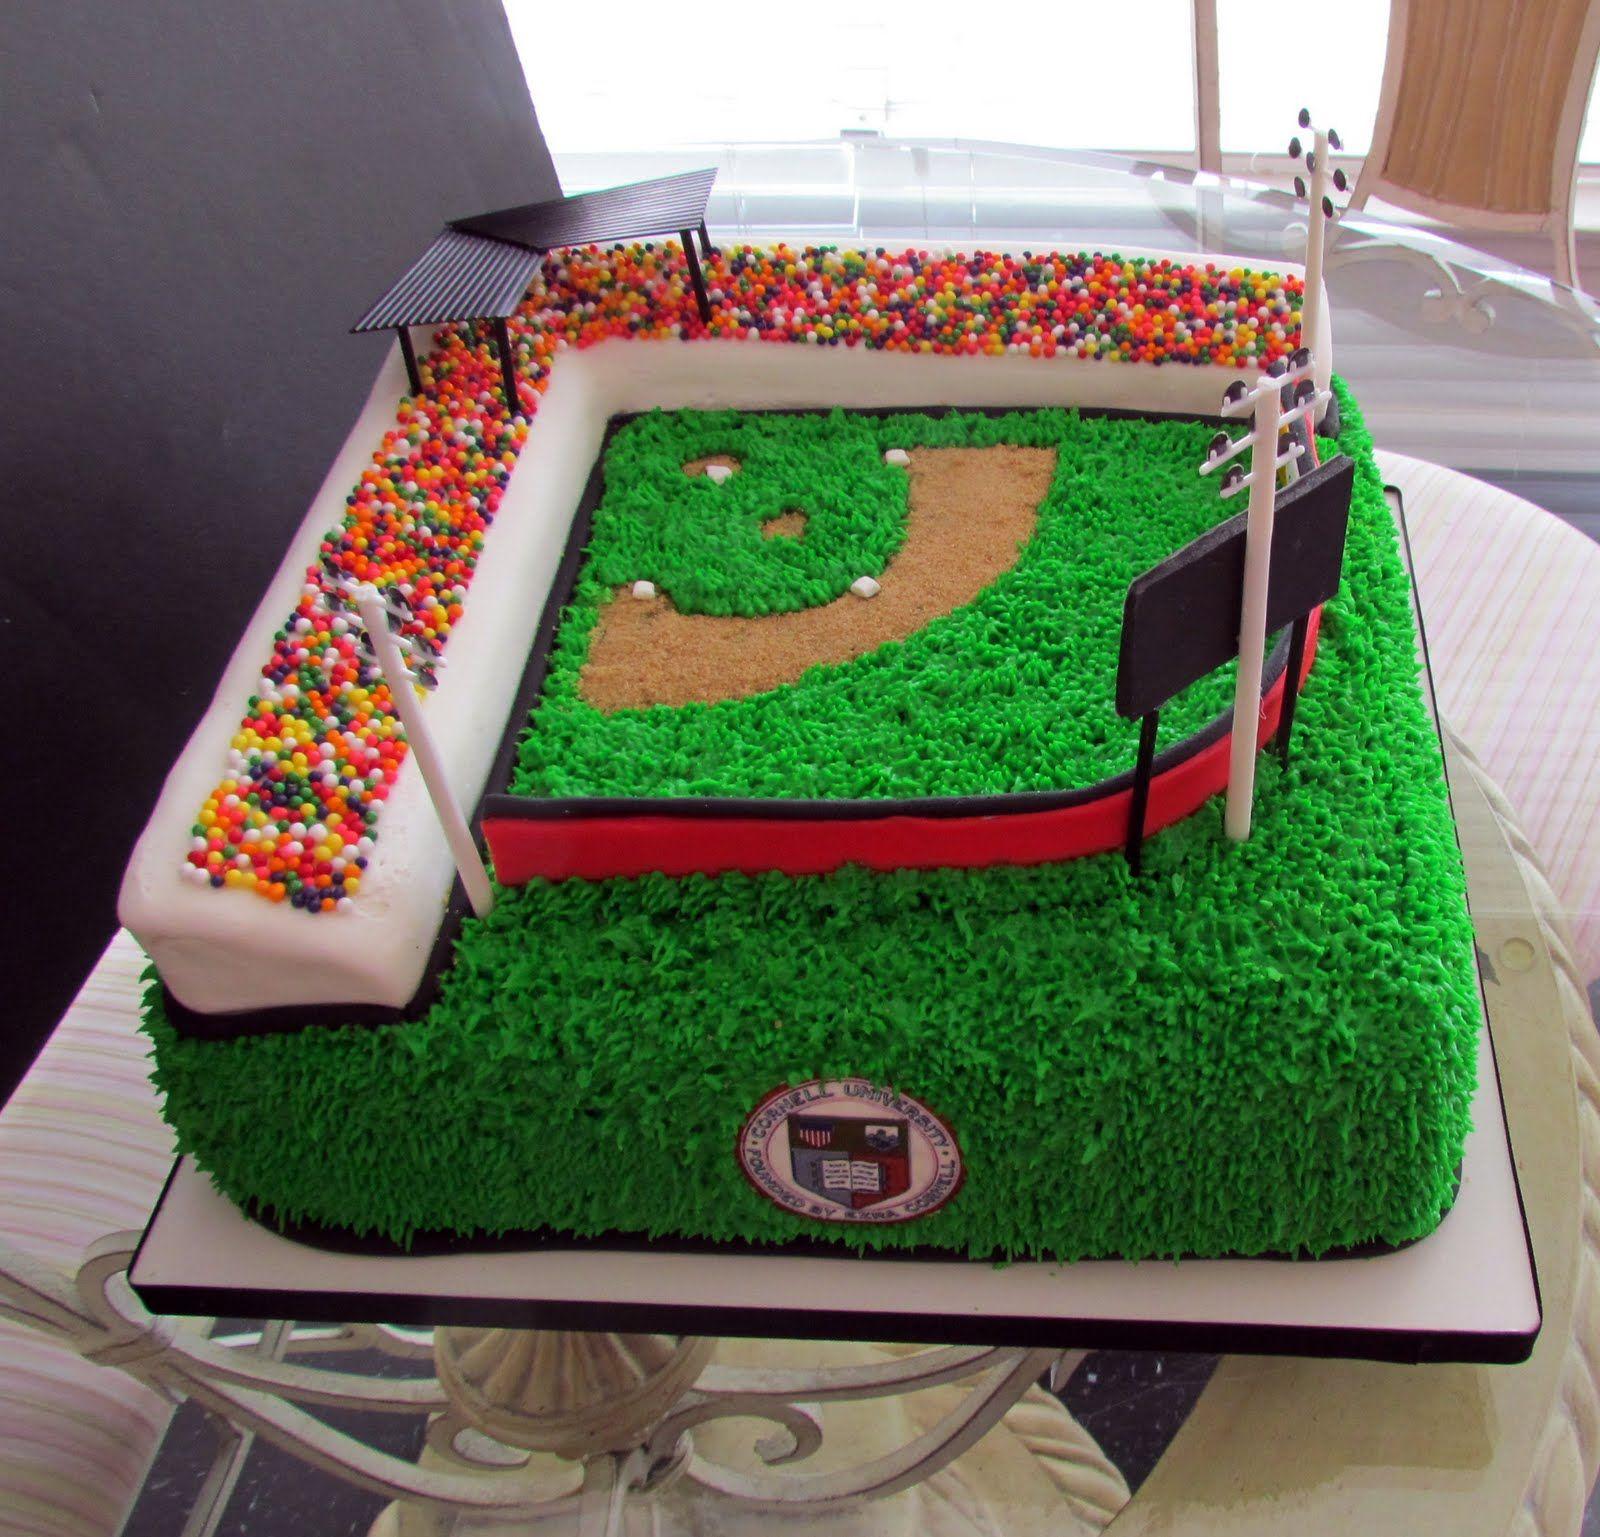 Top Baseball Cakes: Baseball Desserts Galore